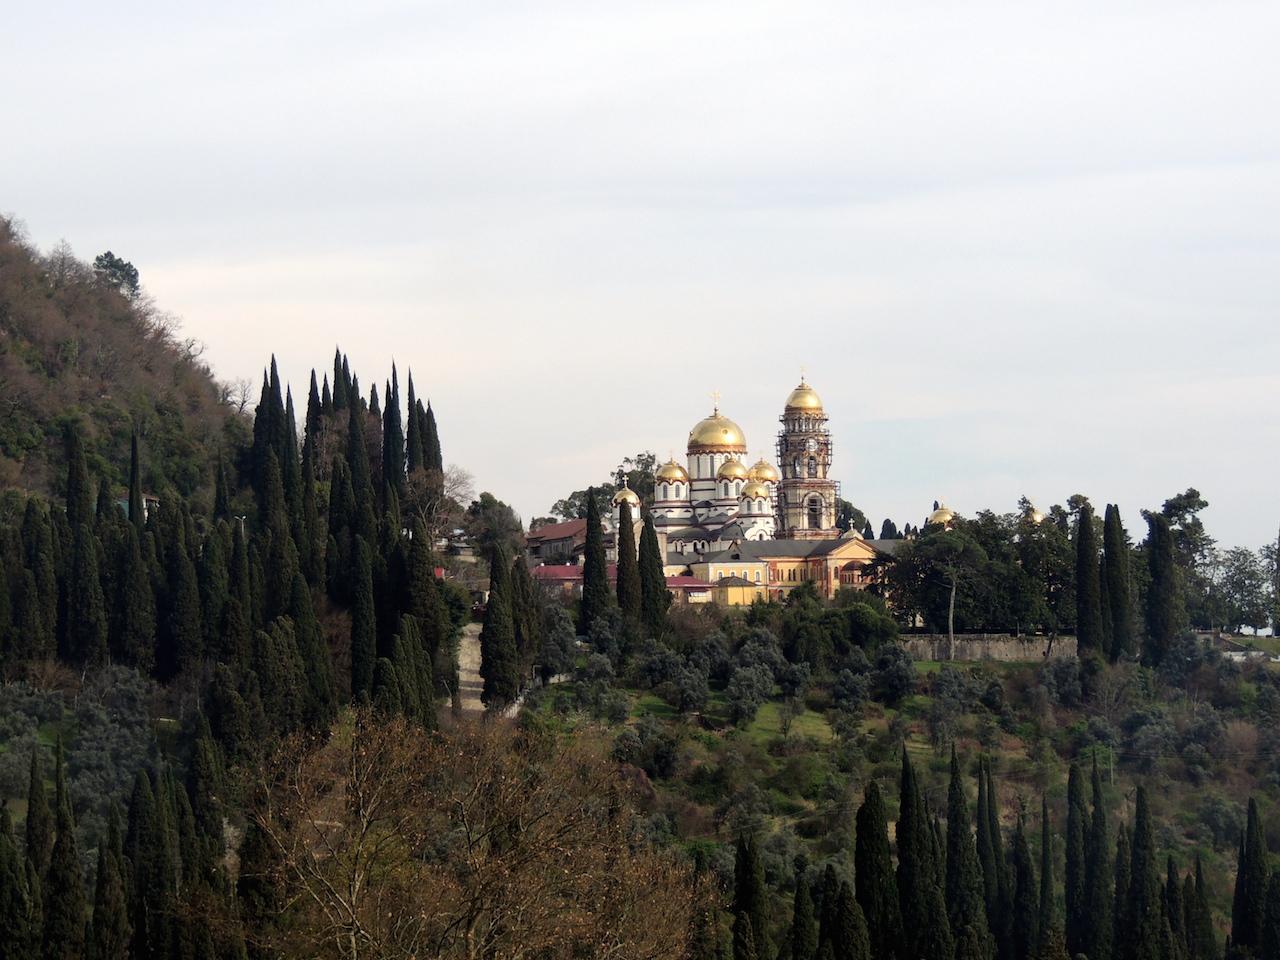 Абхазия Новый Афон Новоафонский монастырь 14 марта 2015 г., 17-050.JPG